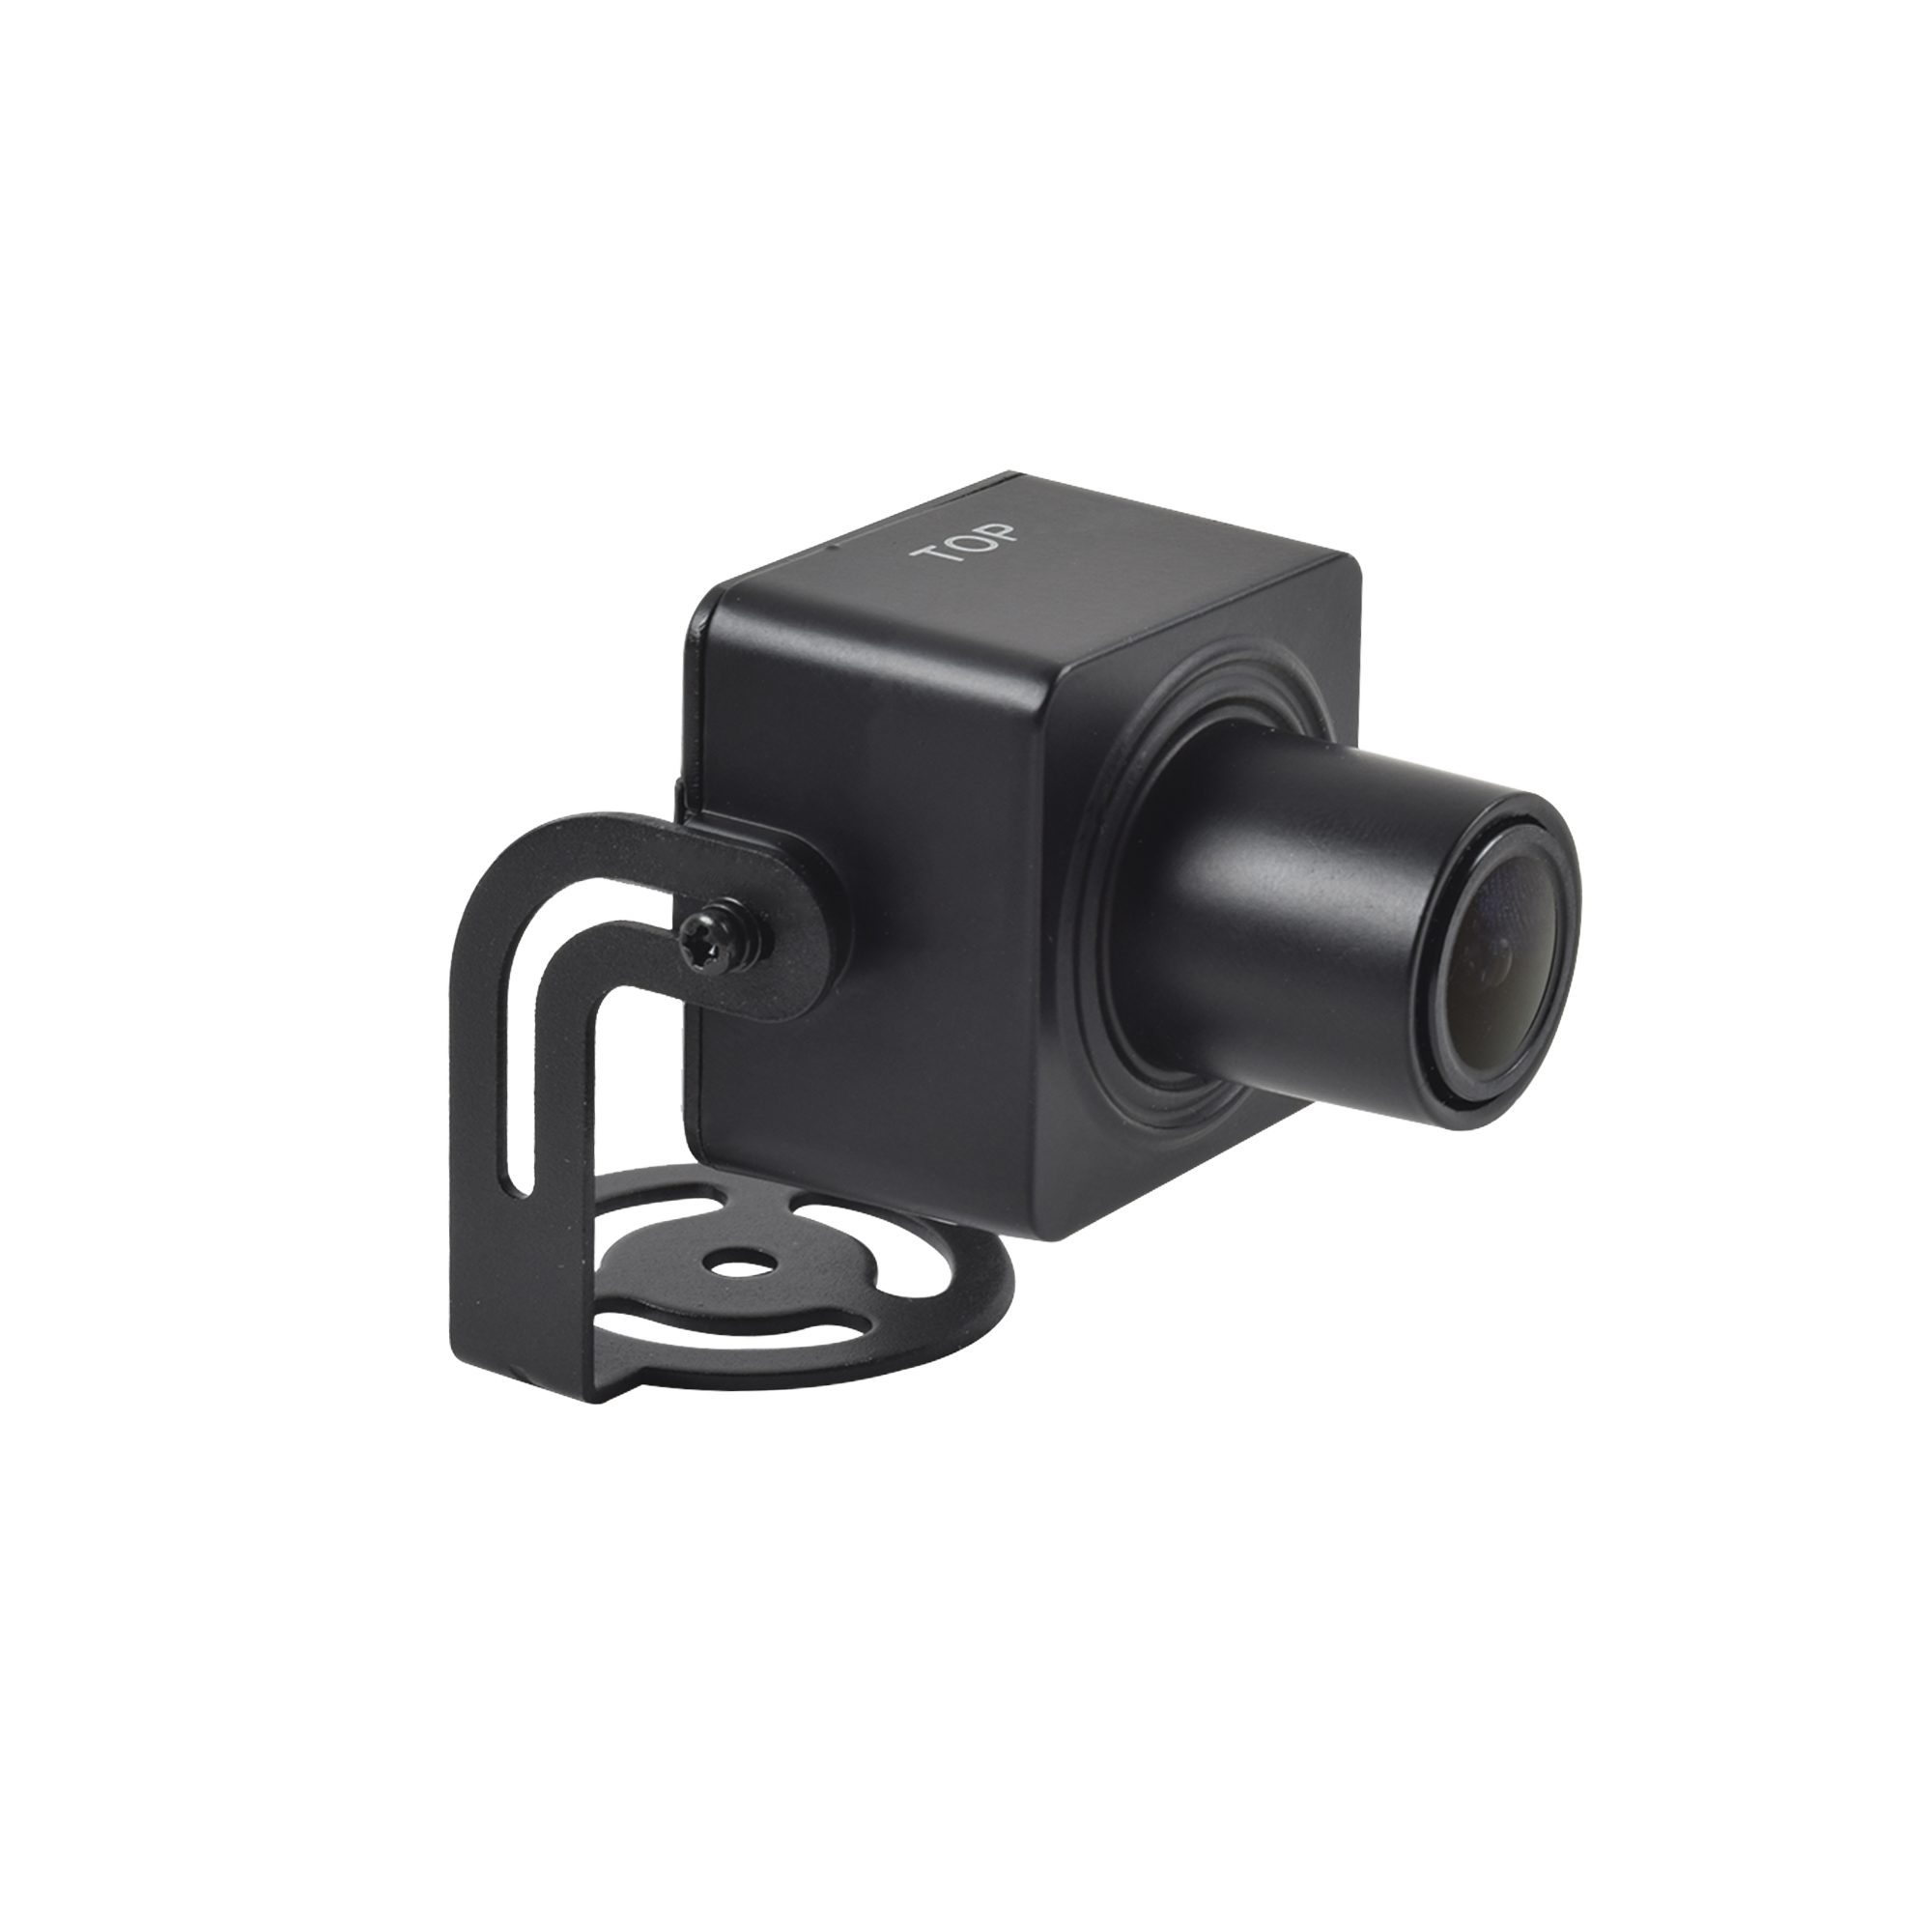 Cámara Oculta IP 2 Megapixel / Lente 2.8 mm / H.265+ / Interior / WDR / 12 VCD / Ultra Baja Iluminación